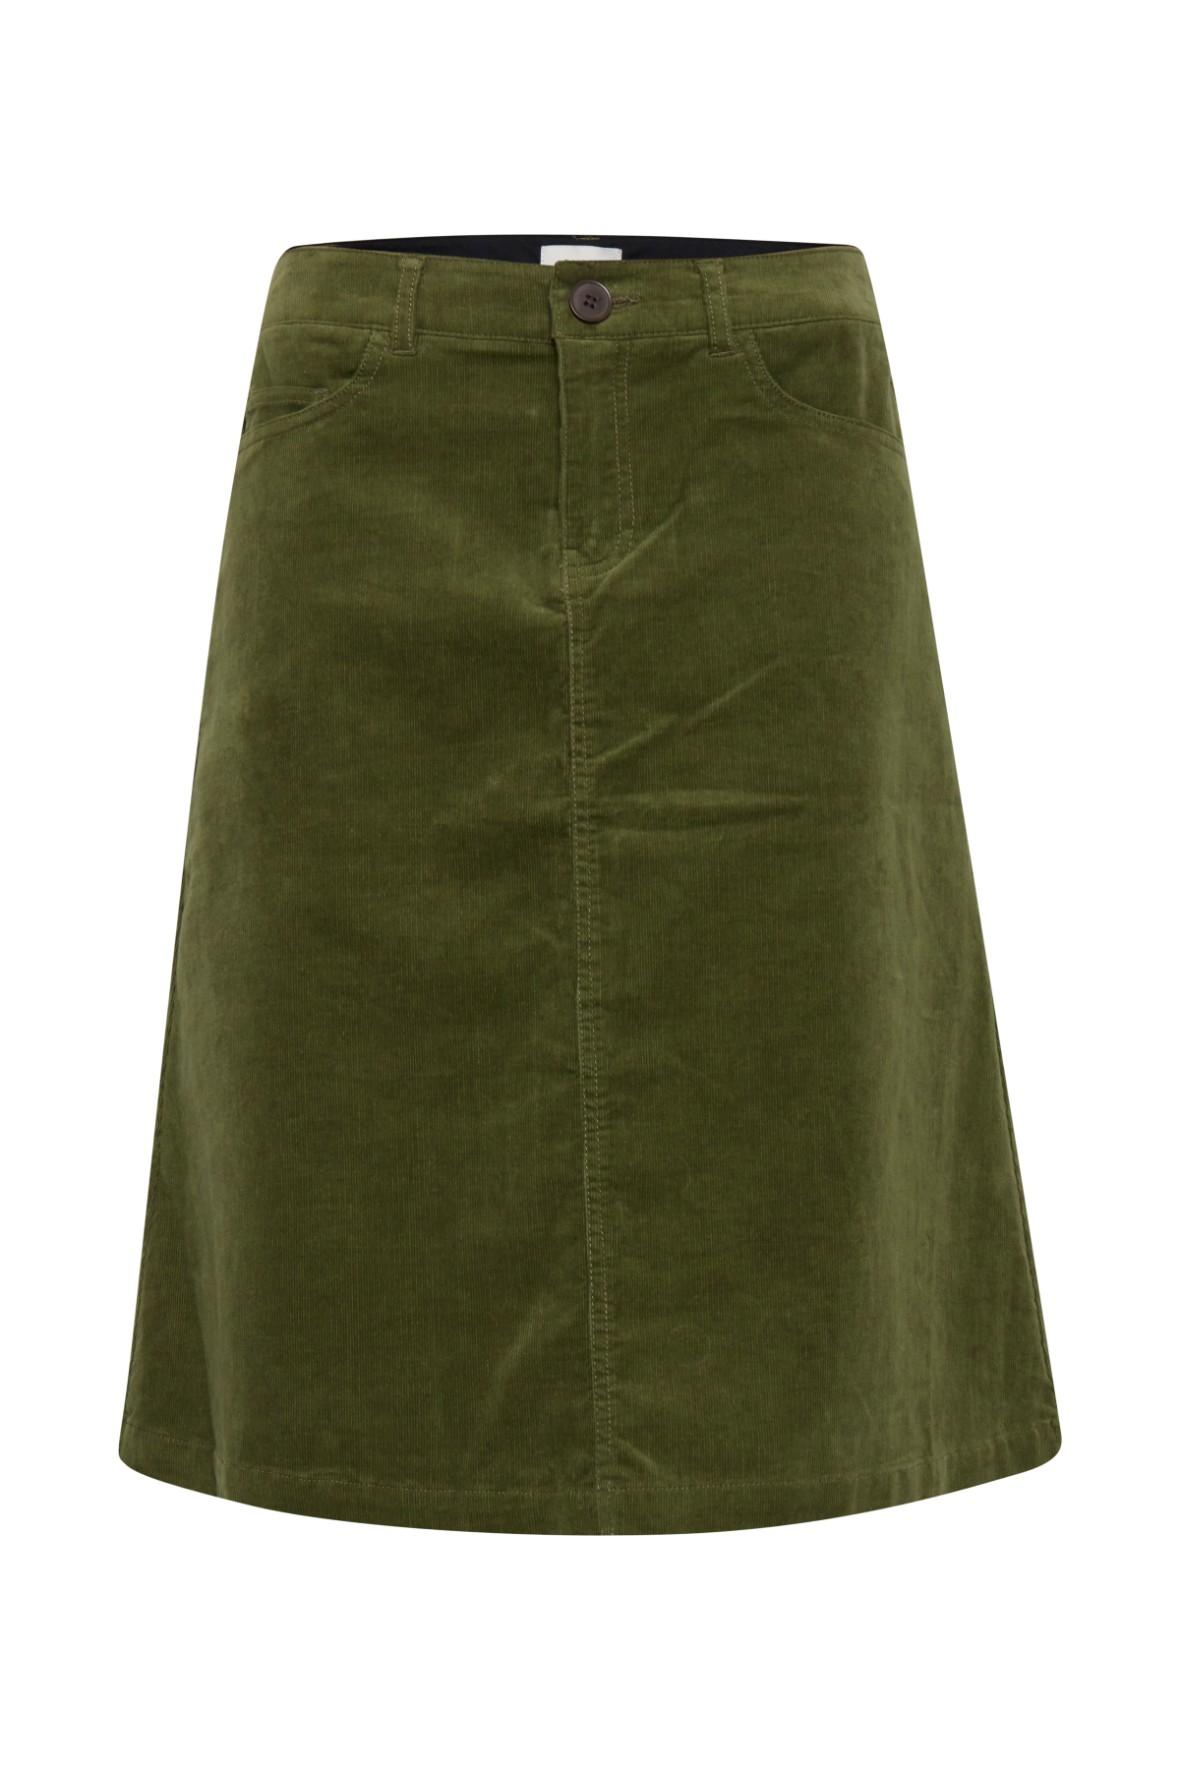 Pulz Kelly nederdel i grøn fløjl med fin struktur Hos Lohse